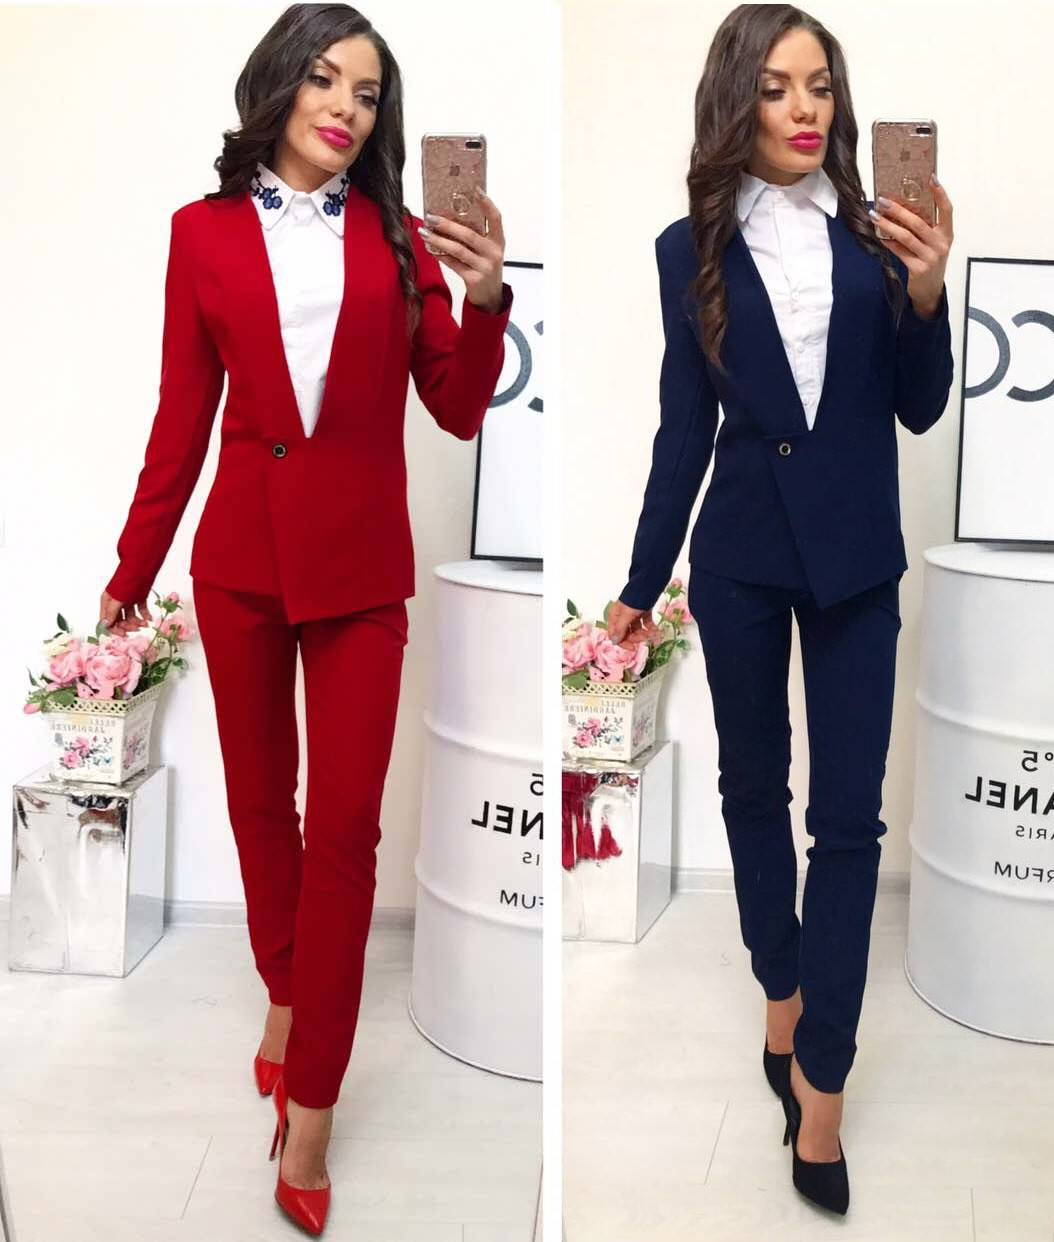 691e802a4fc Женский классический костюм брюки и пиджак -